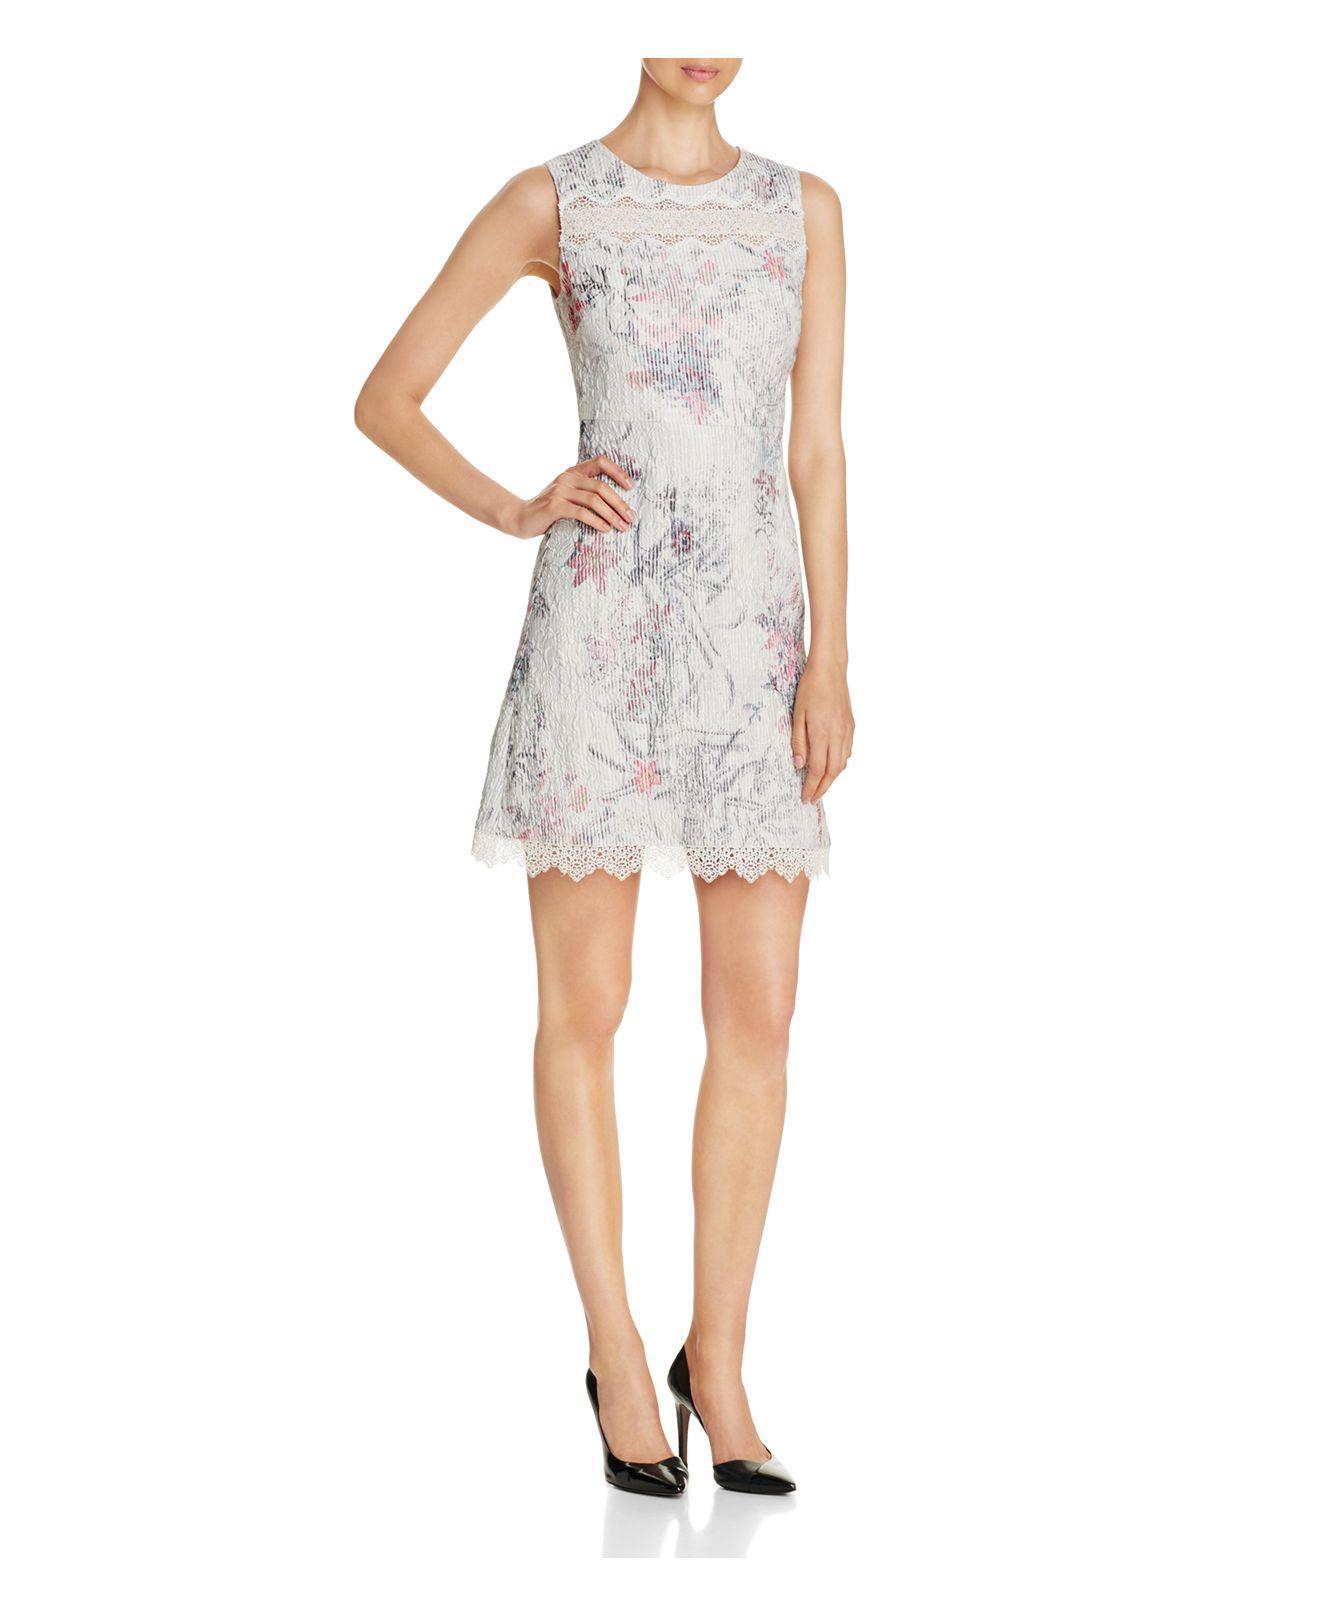 1eea9c9e3d4e Lyst - Elie Tahari Skyla Floral Print Seersucker Dress